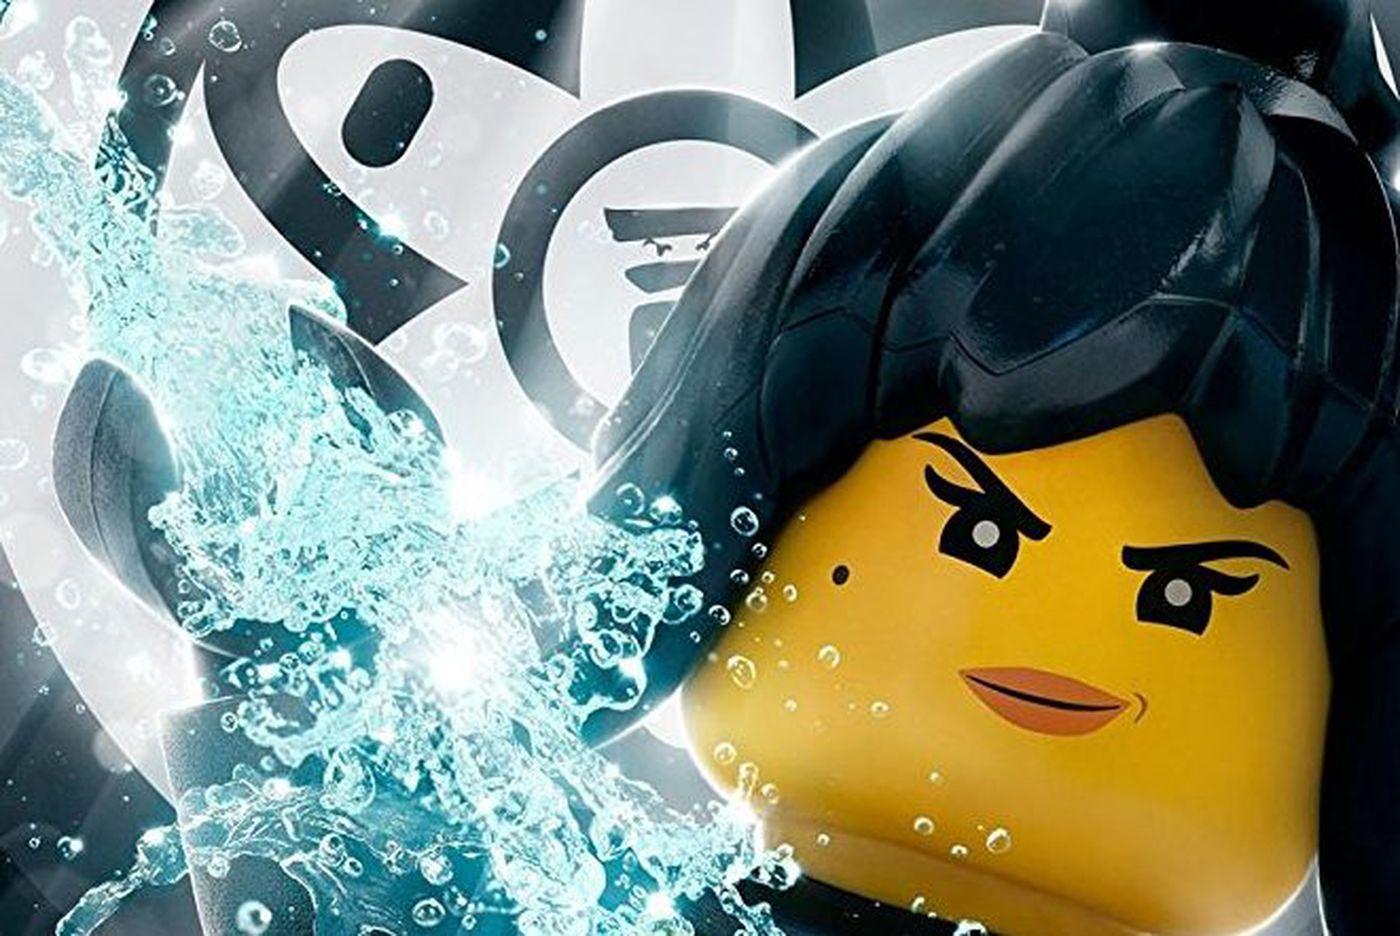 Wayne's Abbi Jacobson stars in 'Ninjago' but won't LEGO of comedy